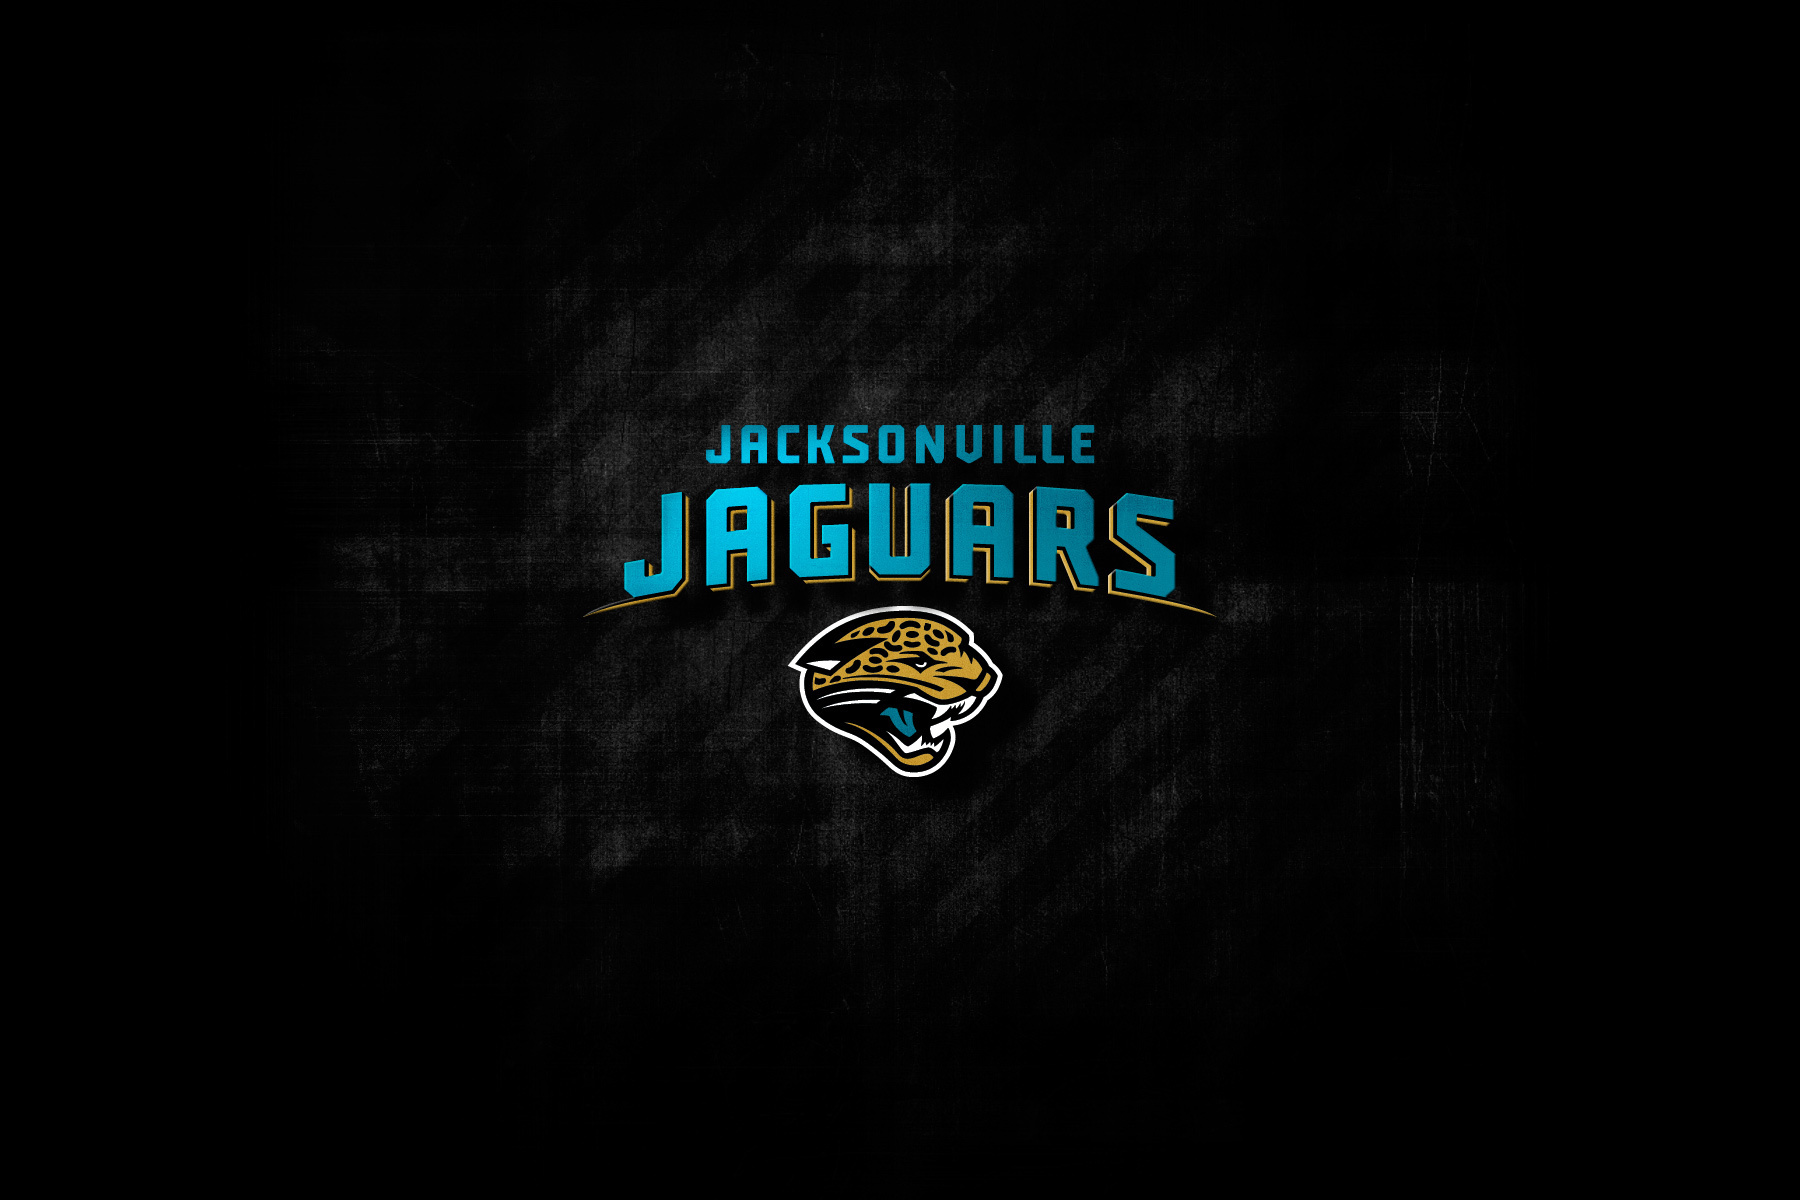 Jacksonville Jaguars Wallpaper Image Group 35 1800x1200